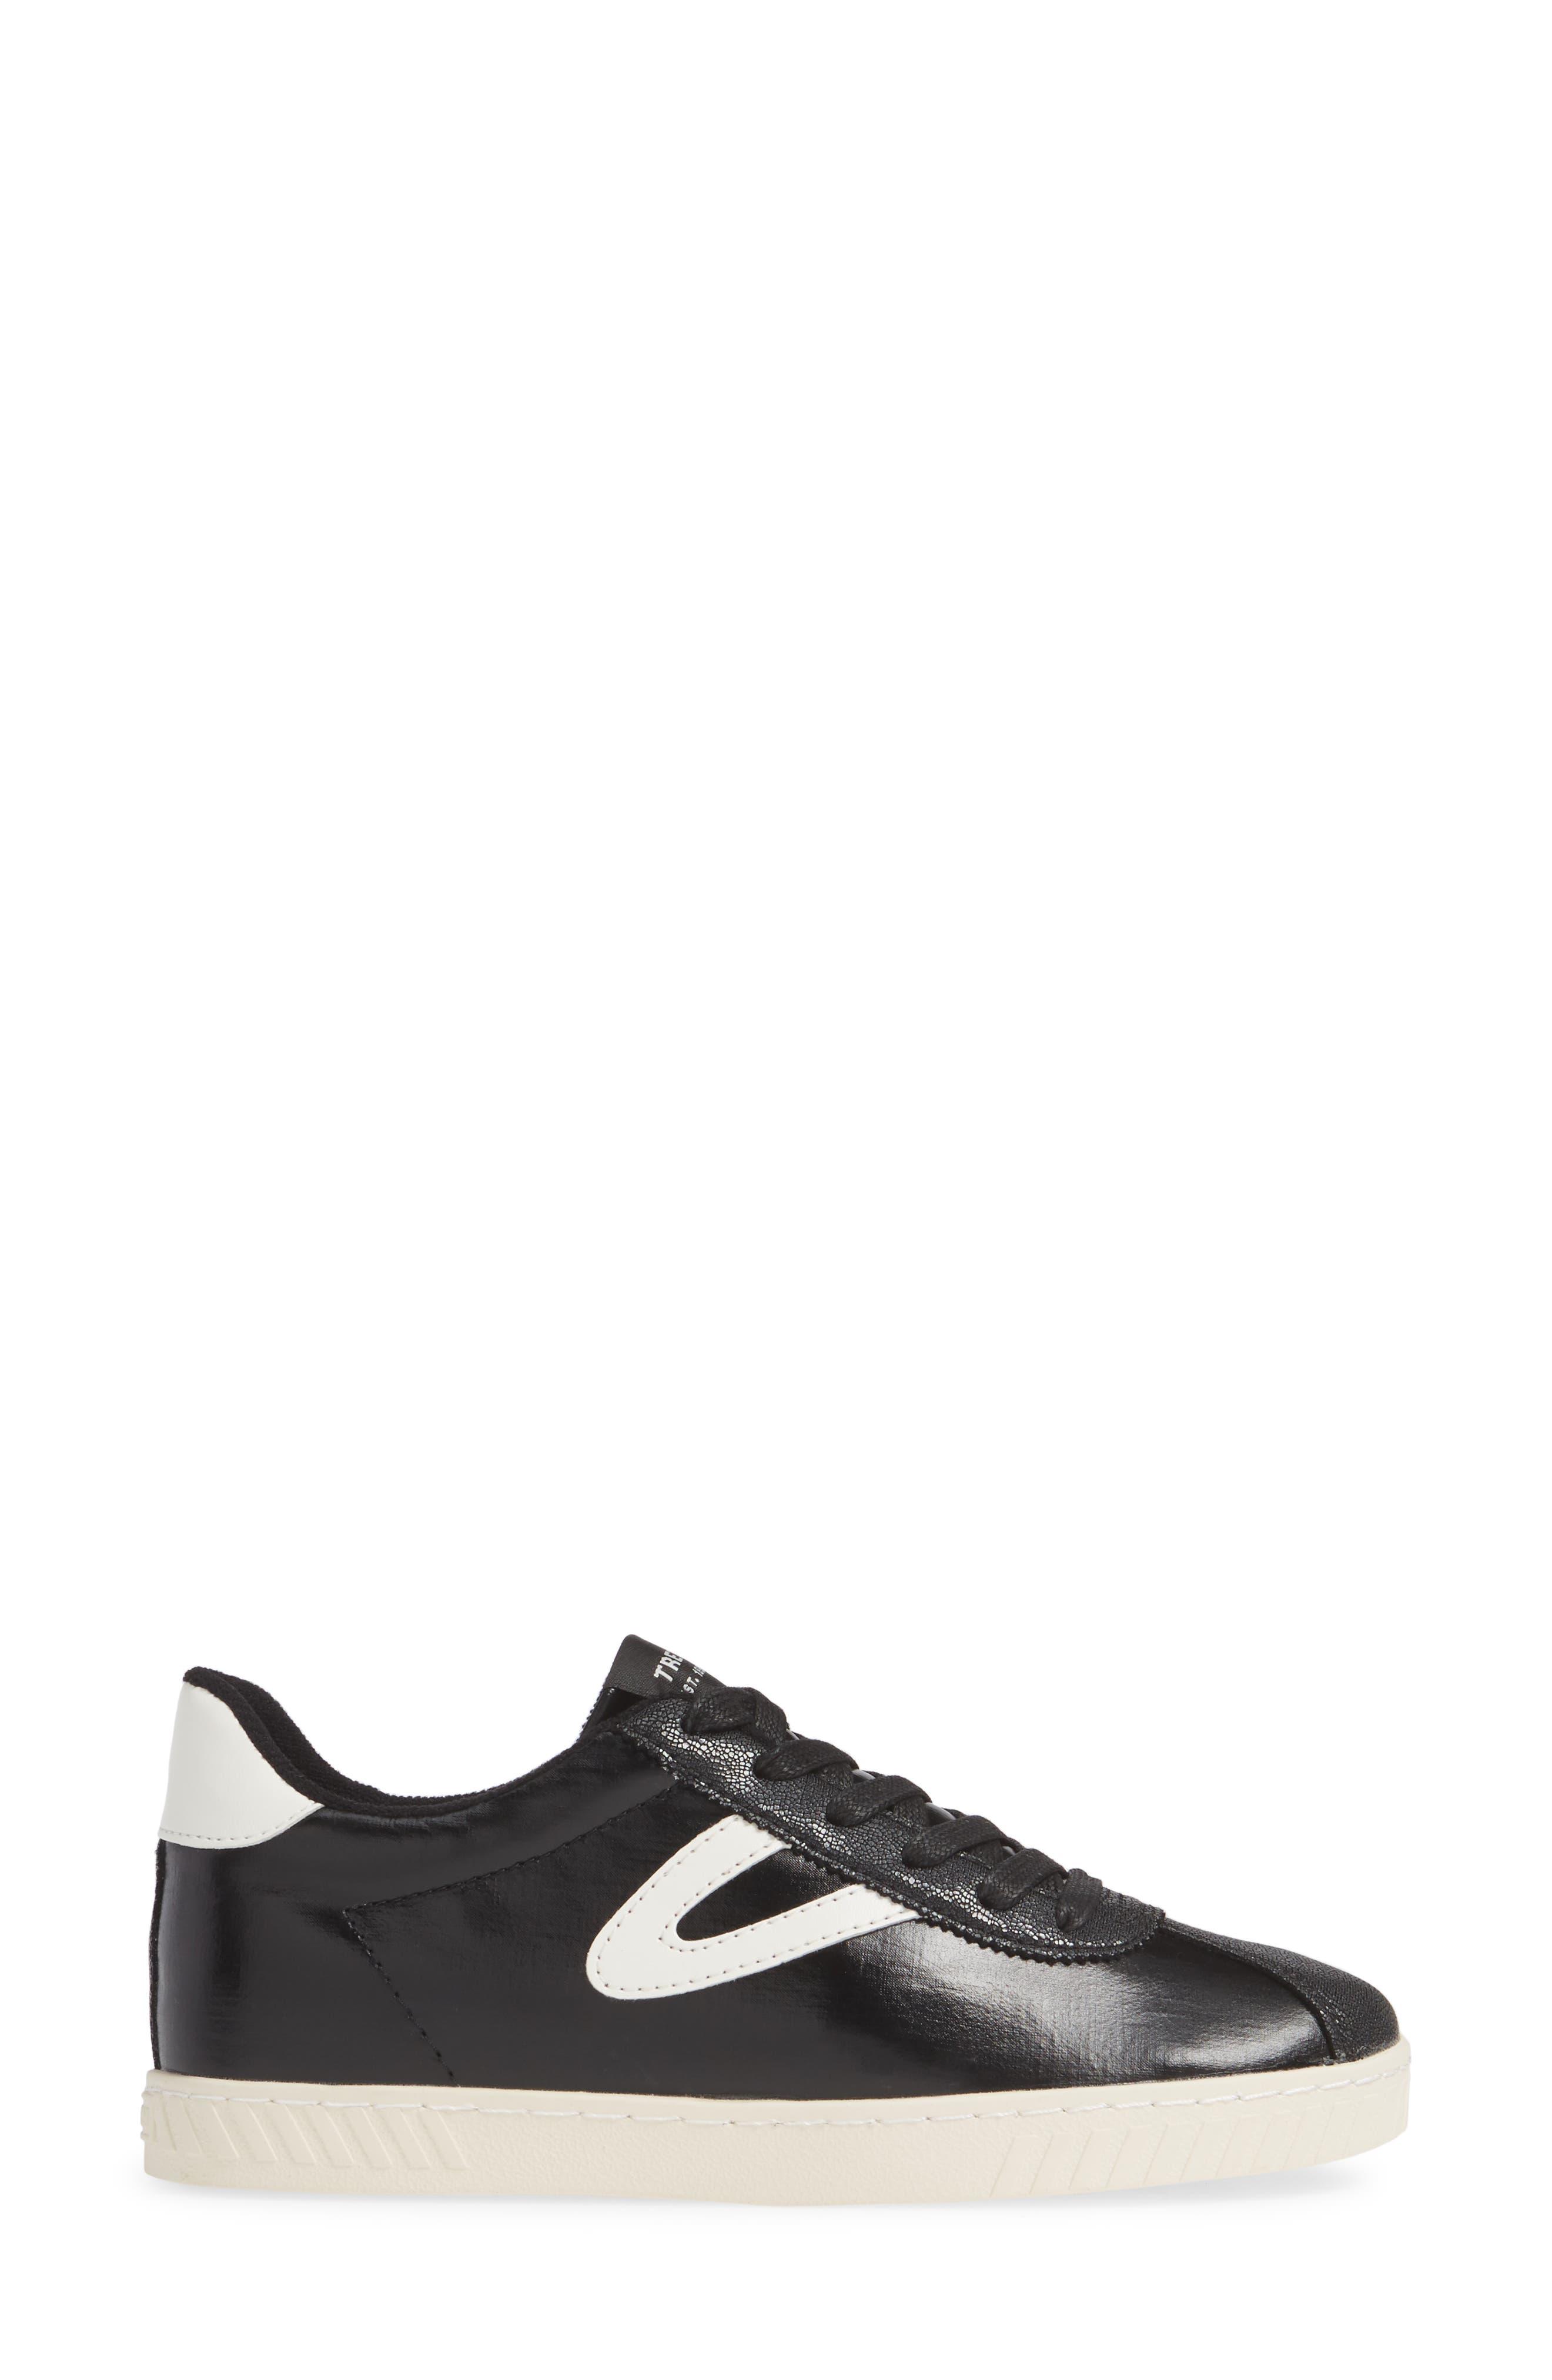 ,                             Callie 5 Sneaker,                             Alternate thumbnail 3, color,                             BLACK/ VINTAGE WHITE FABRIC